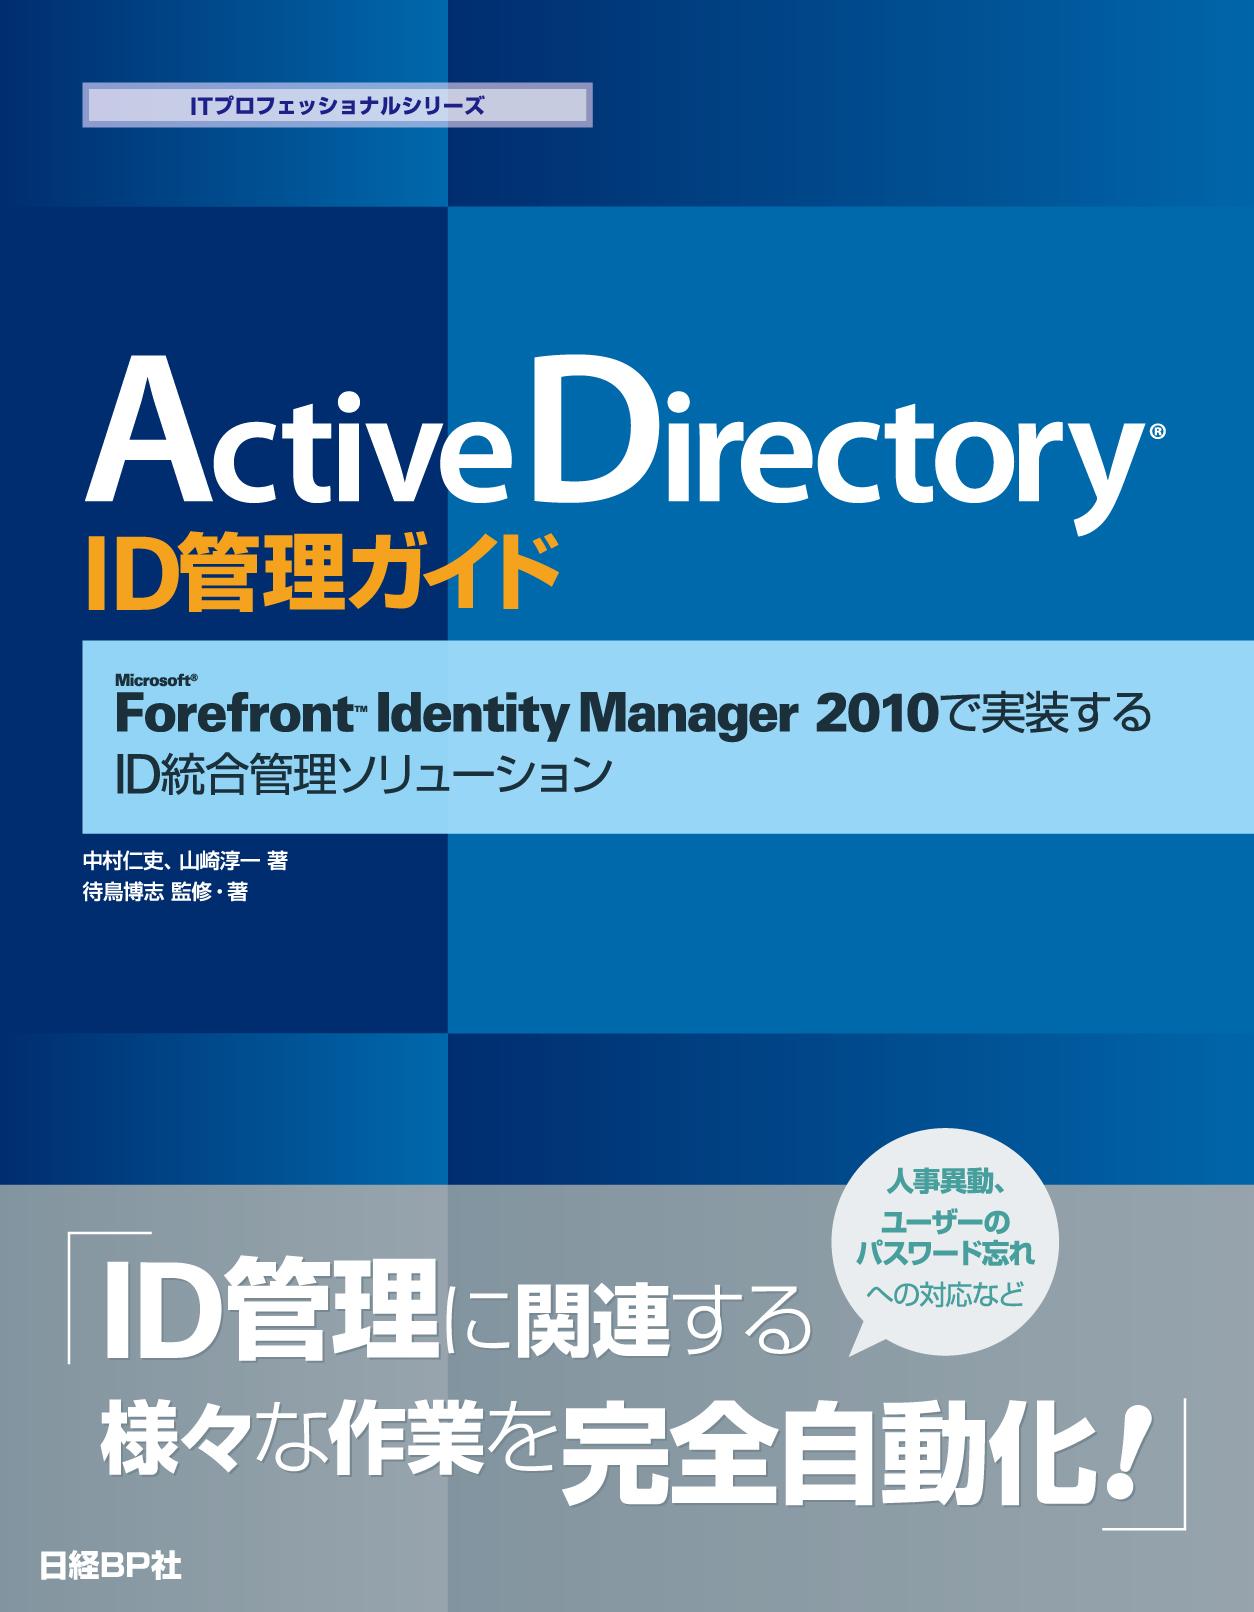 Active Directory ID管理ガイド